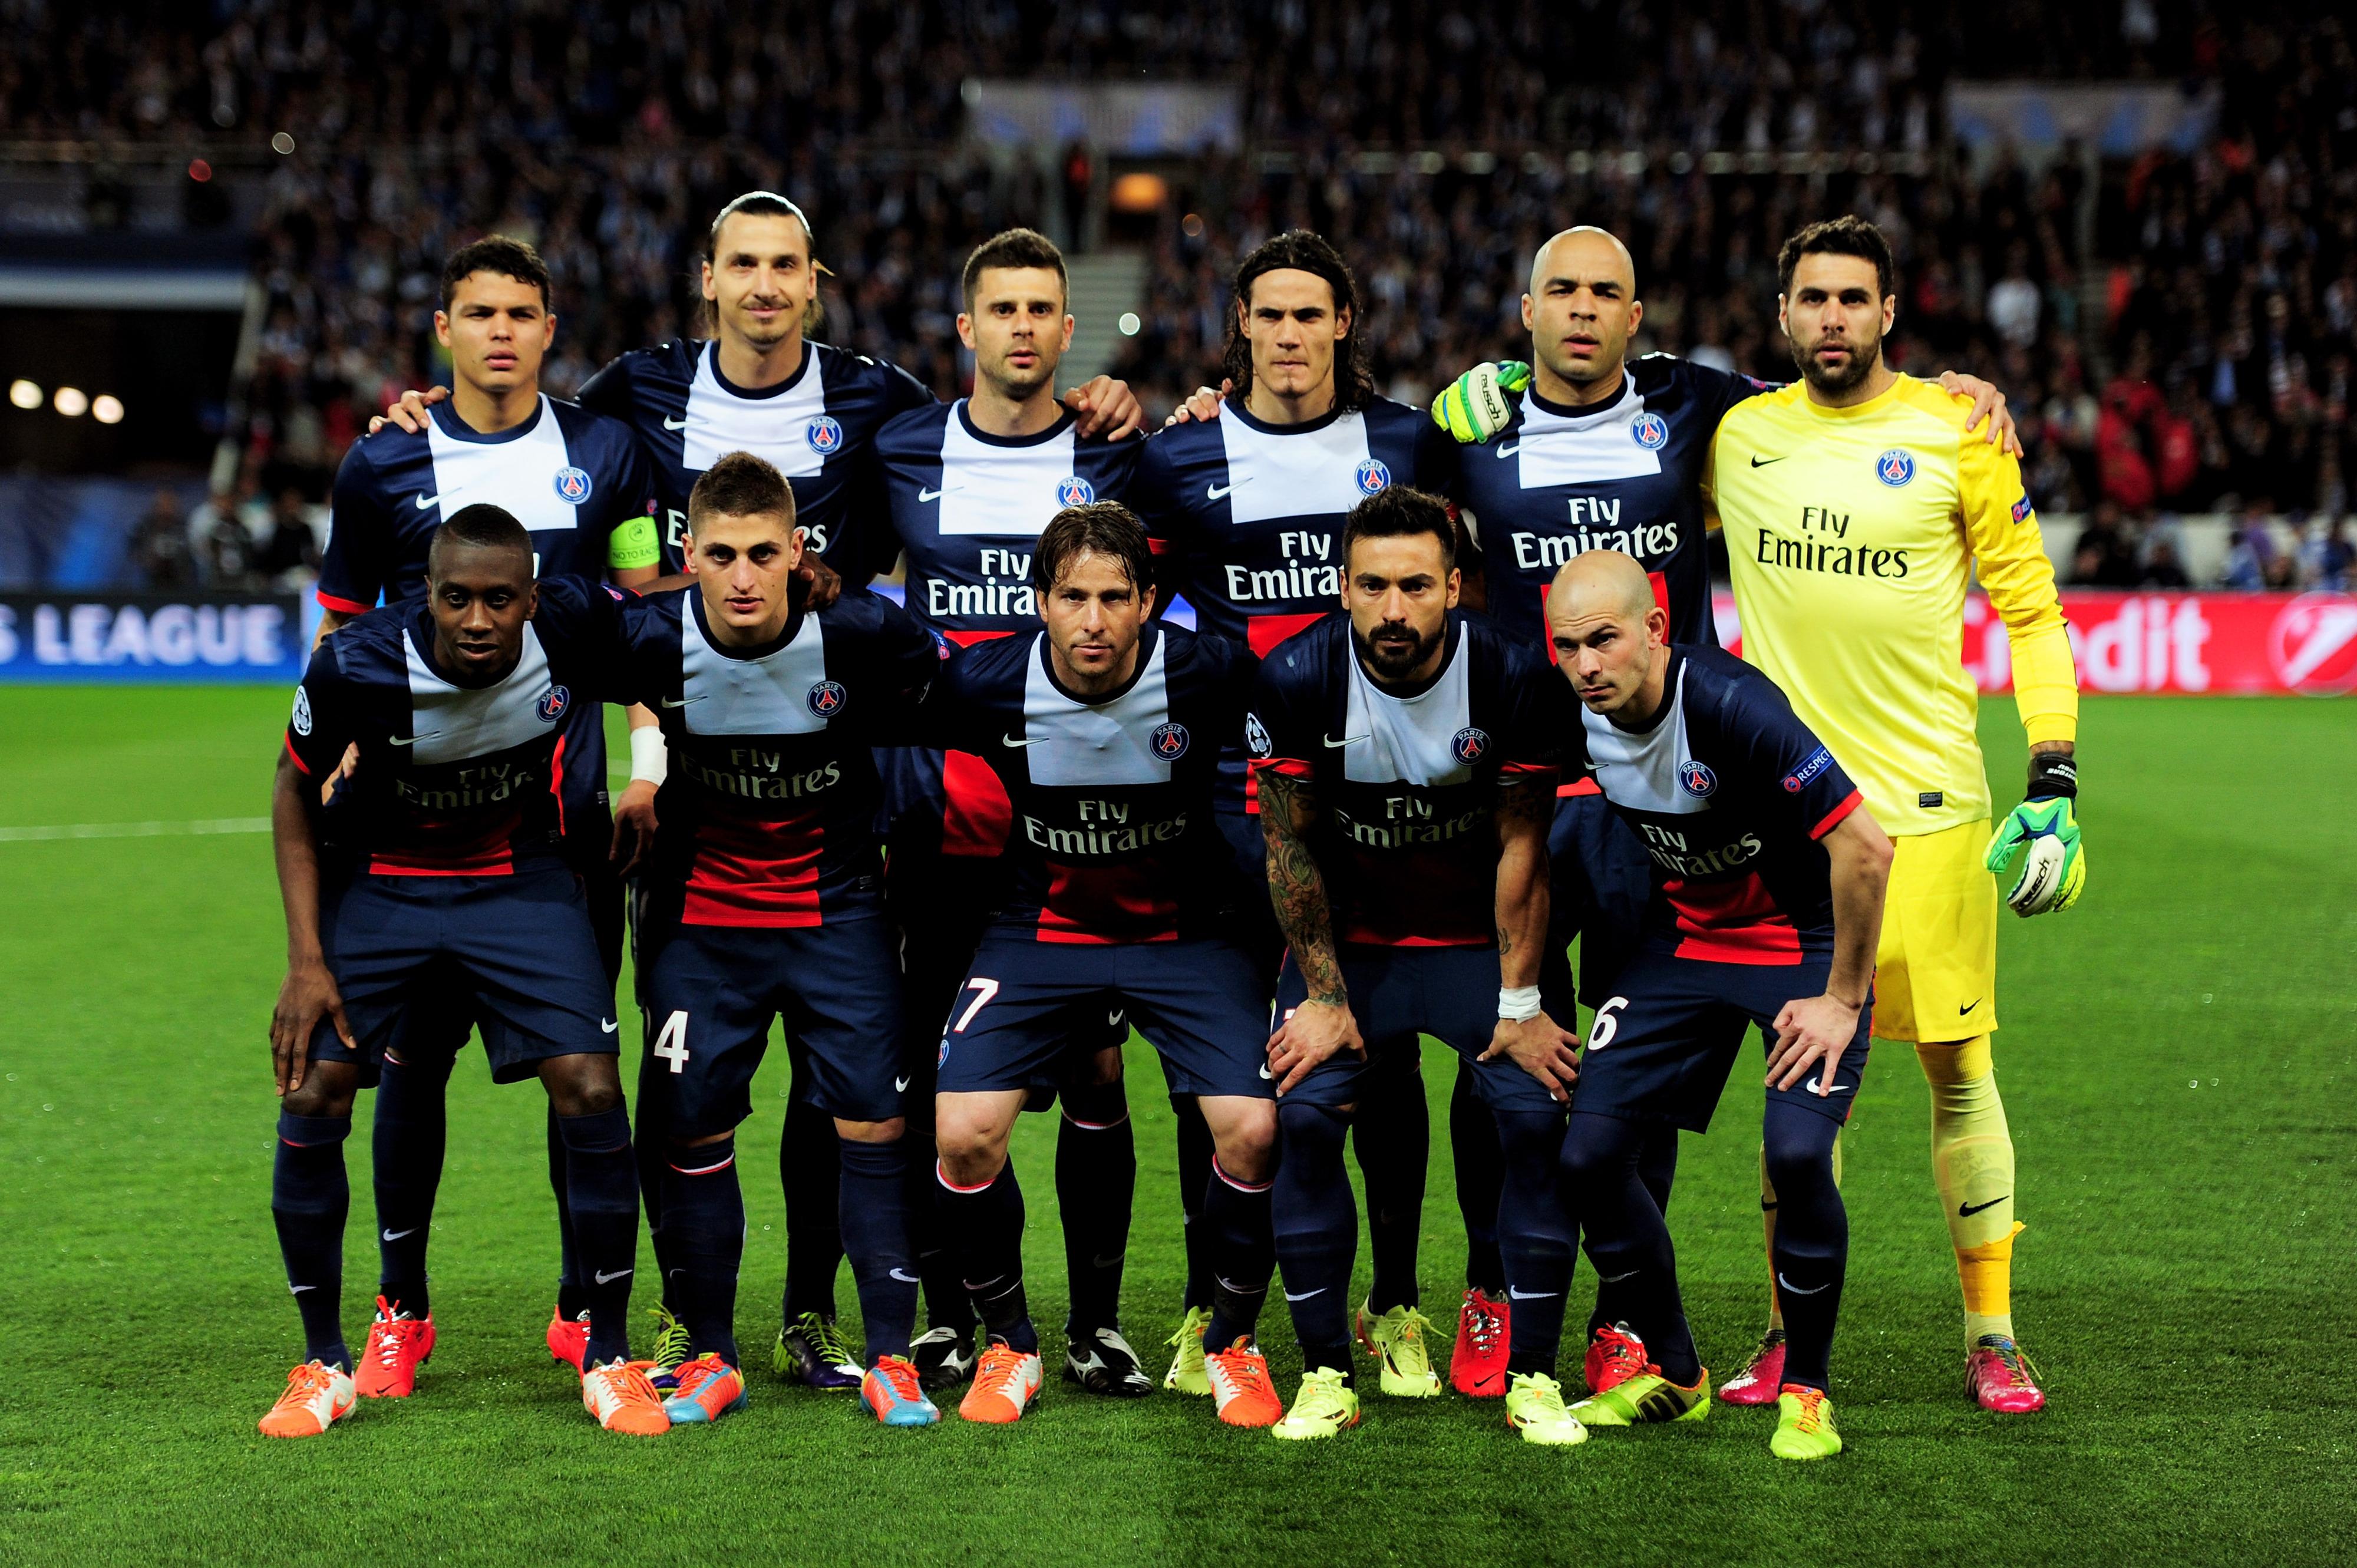 Paris Saint-Germain one step away from joining the European elite